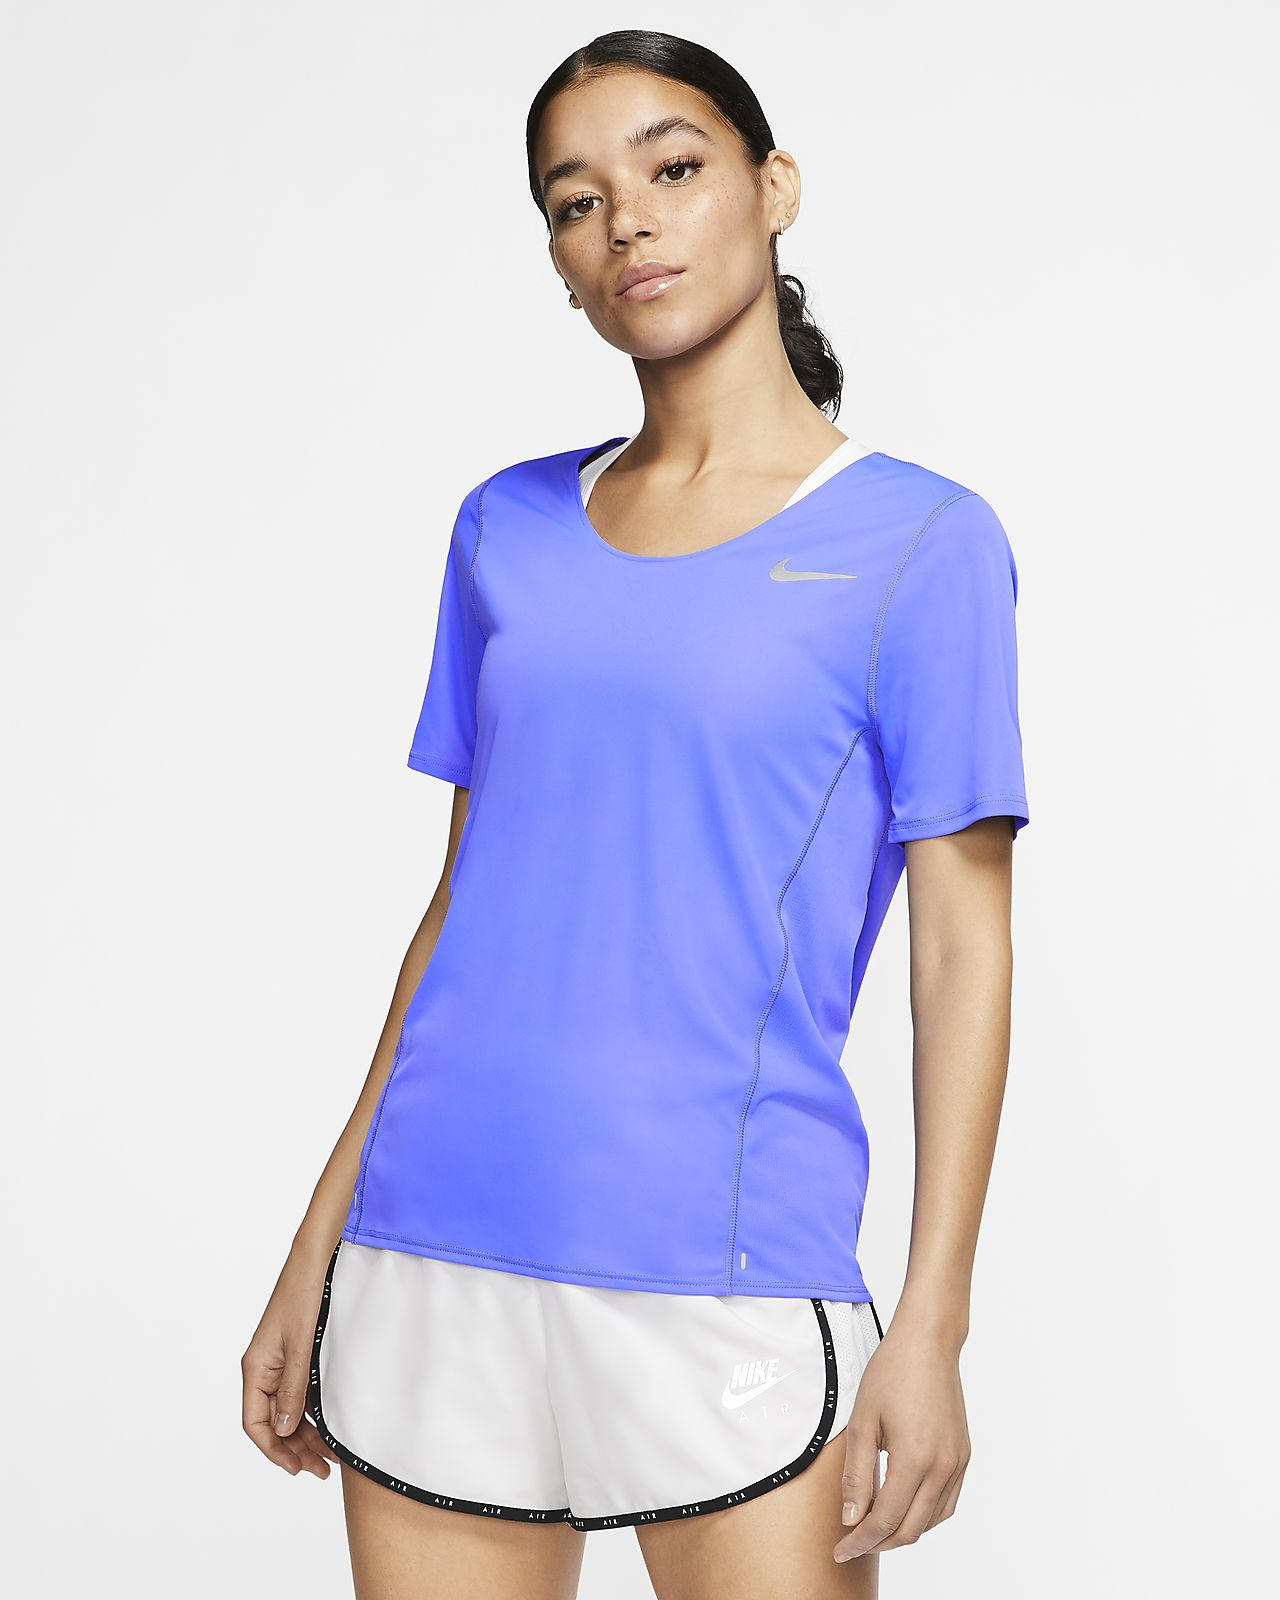 Camisola de running de manga curta Nike City Sleek para mulher